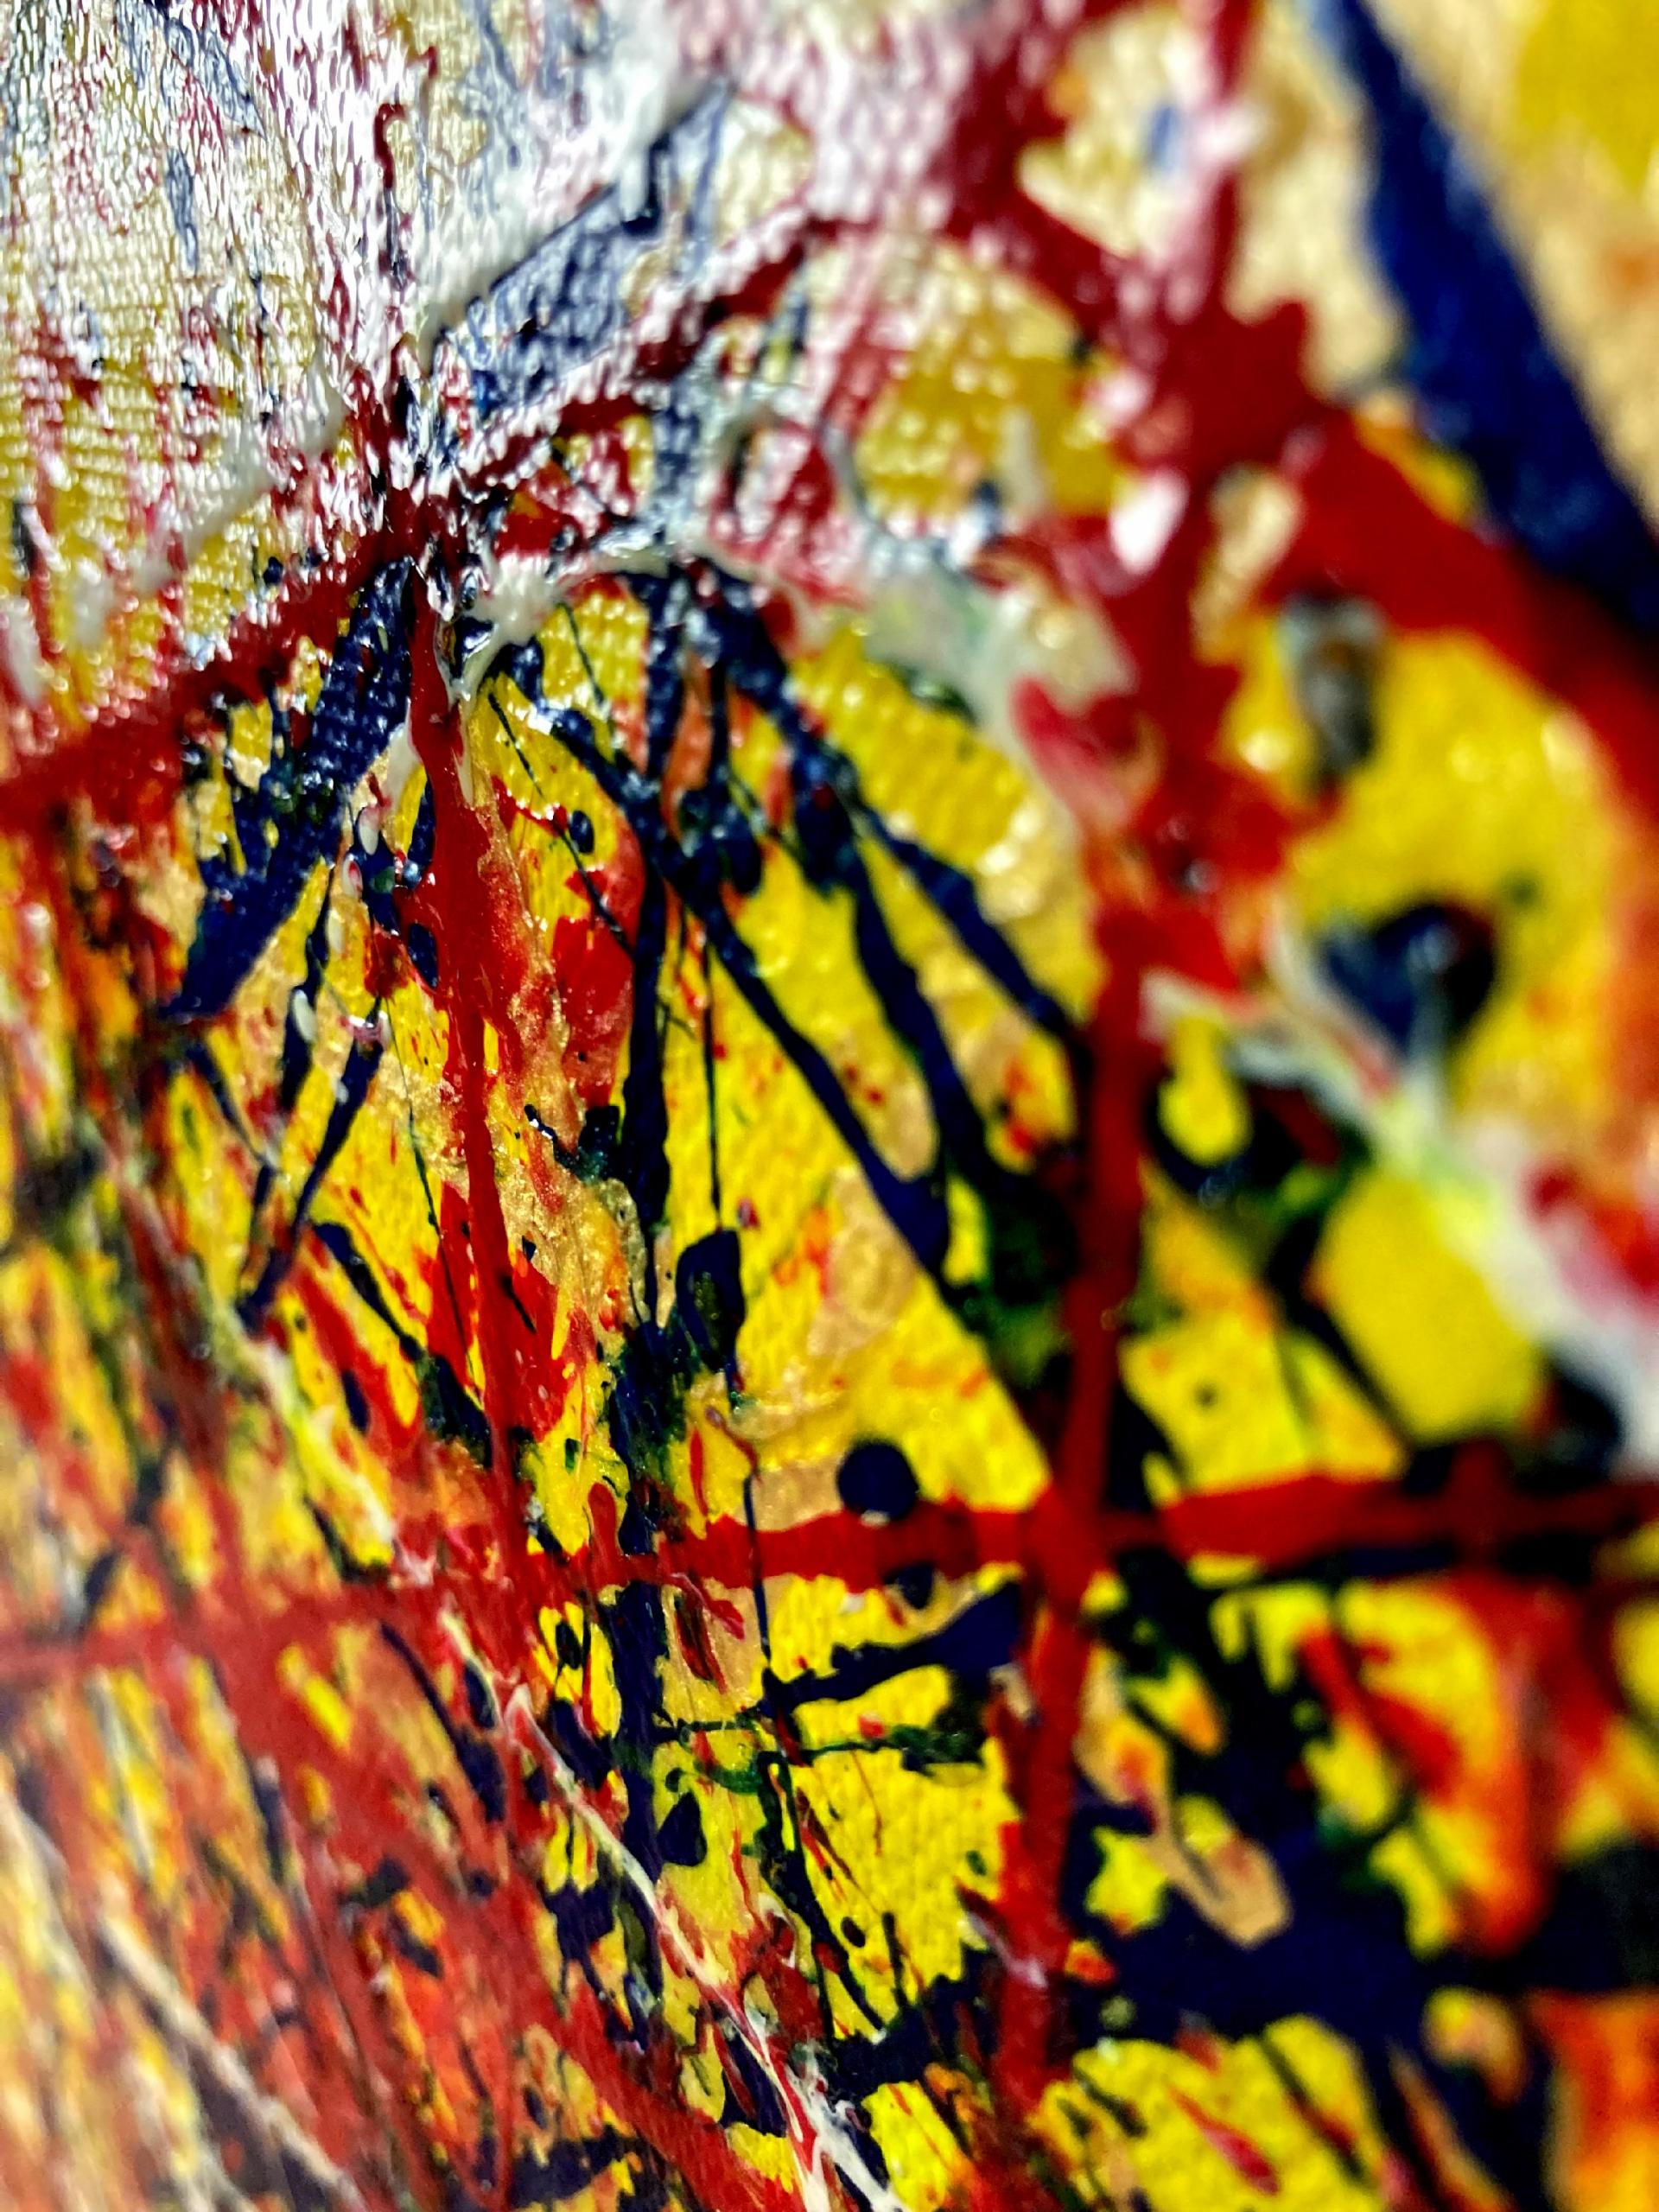 TEXTURE / Colorful Display of Affection 3 (2021) / ARTIST: NESTOR TORO